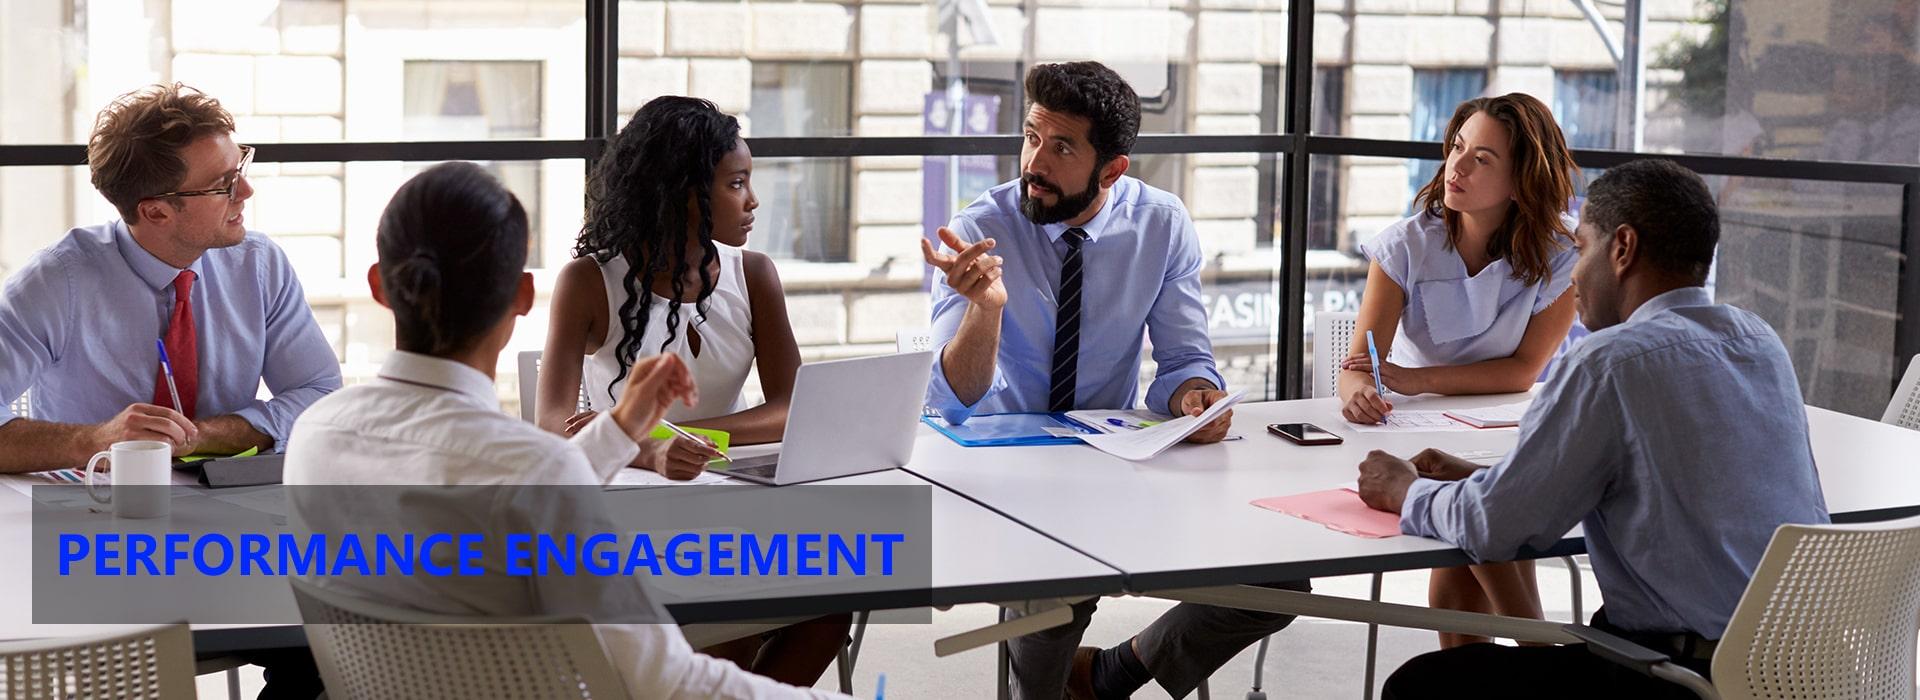 Performance Engagement